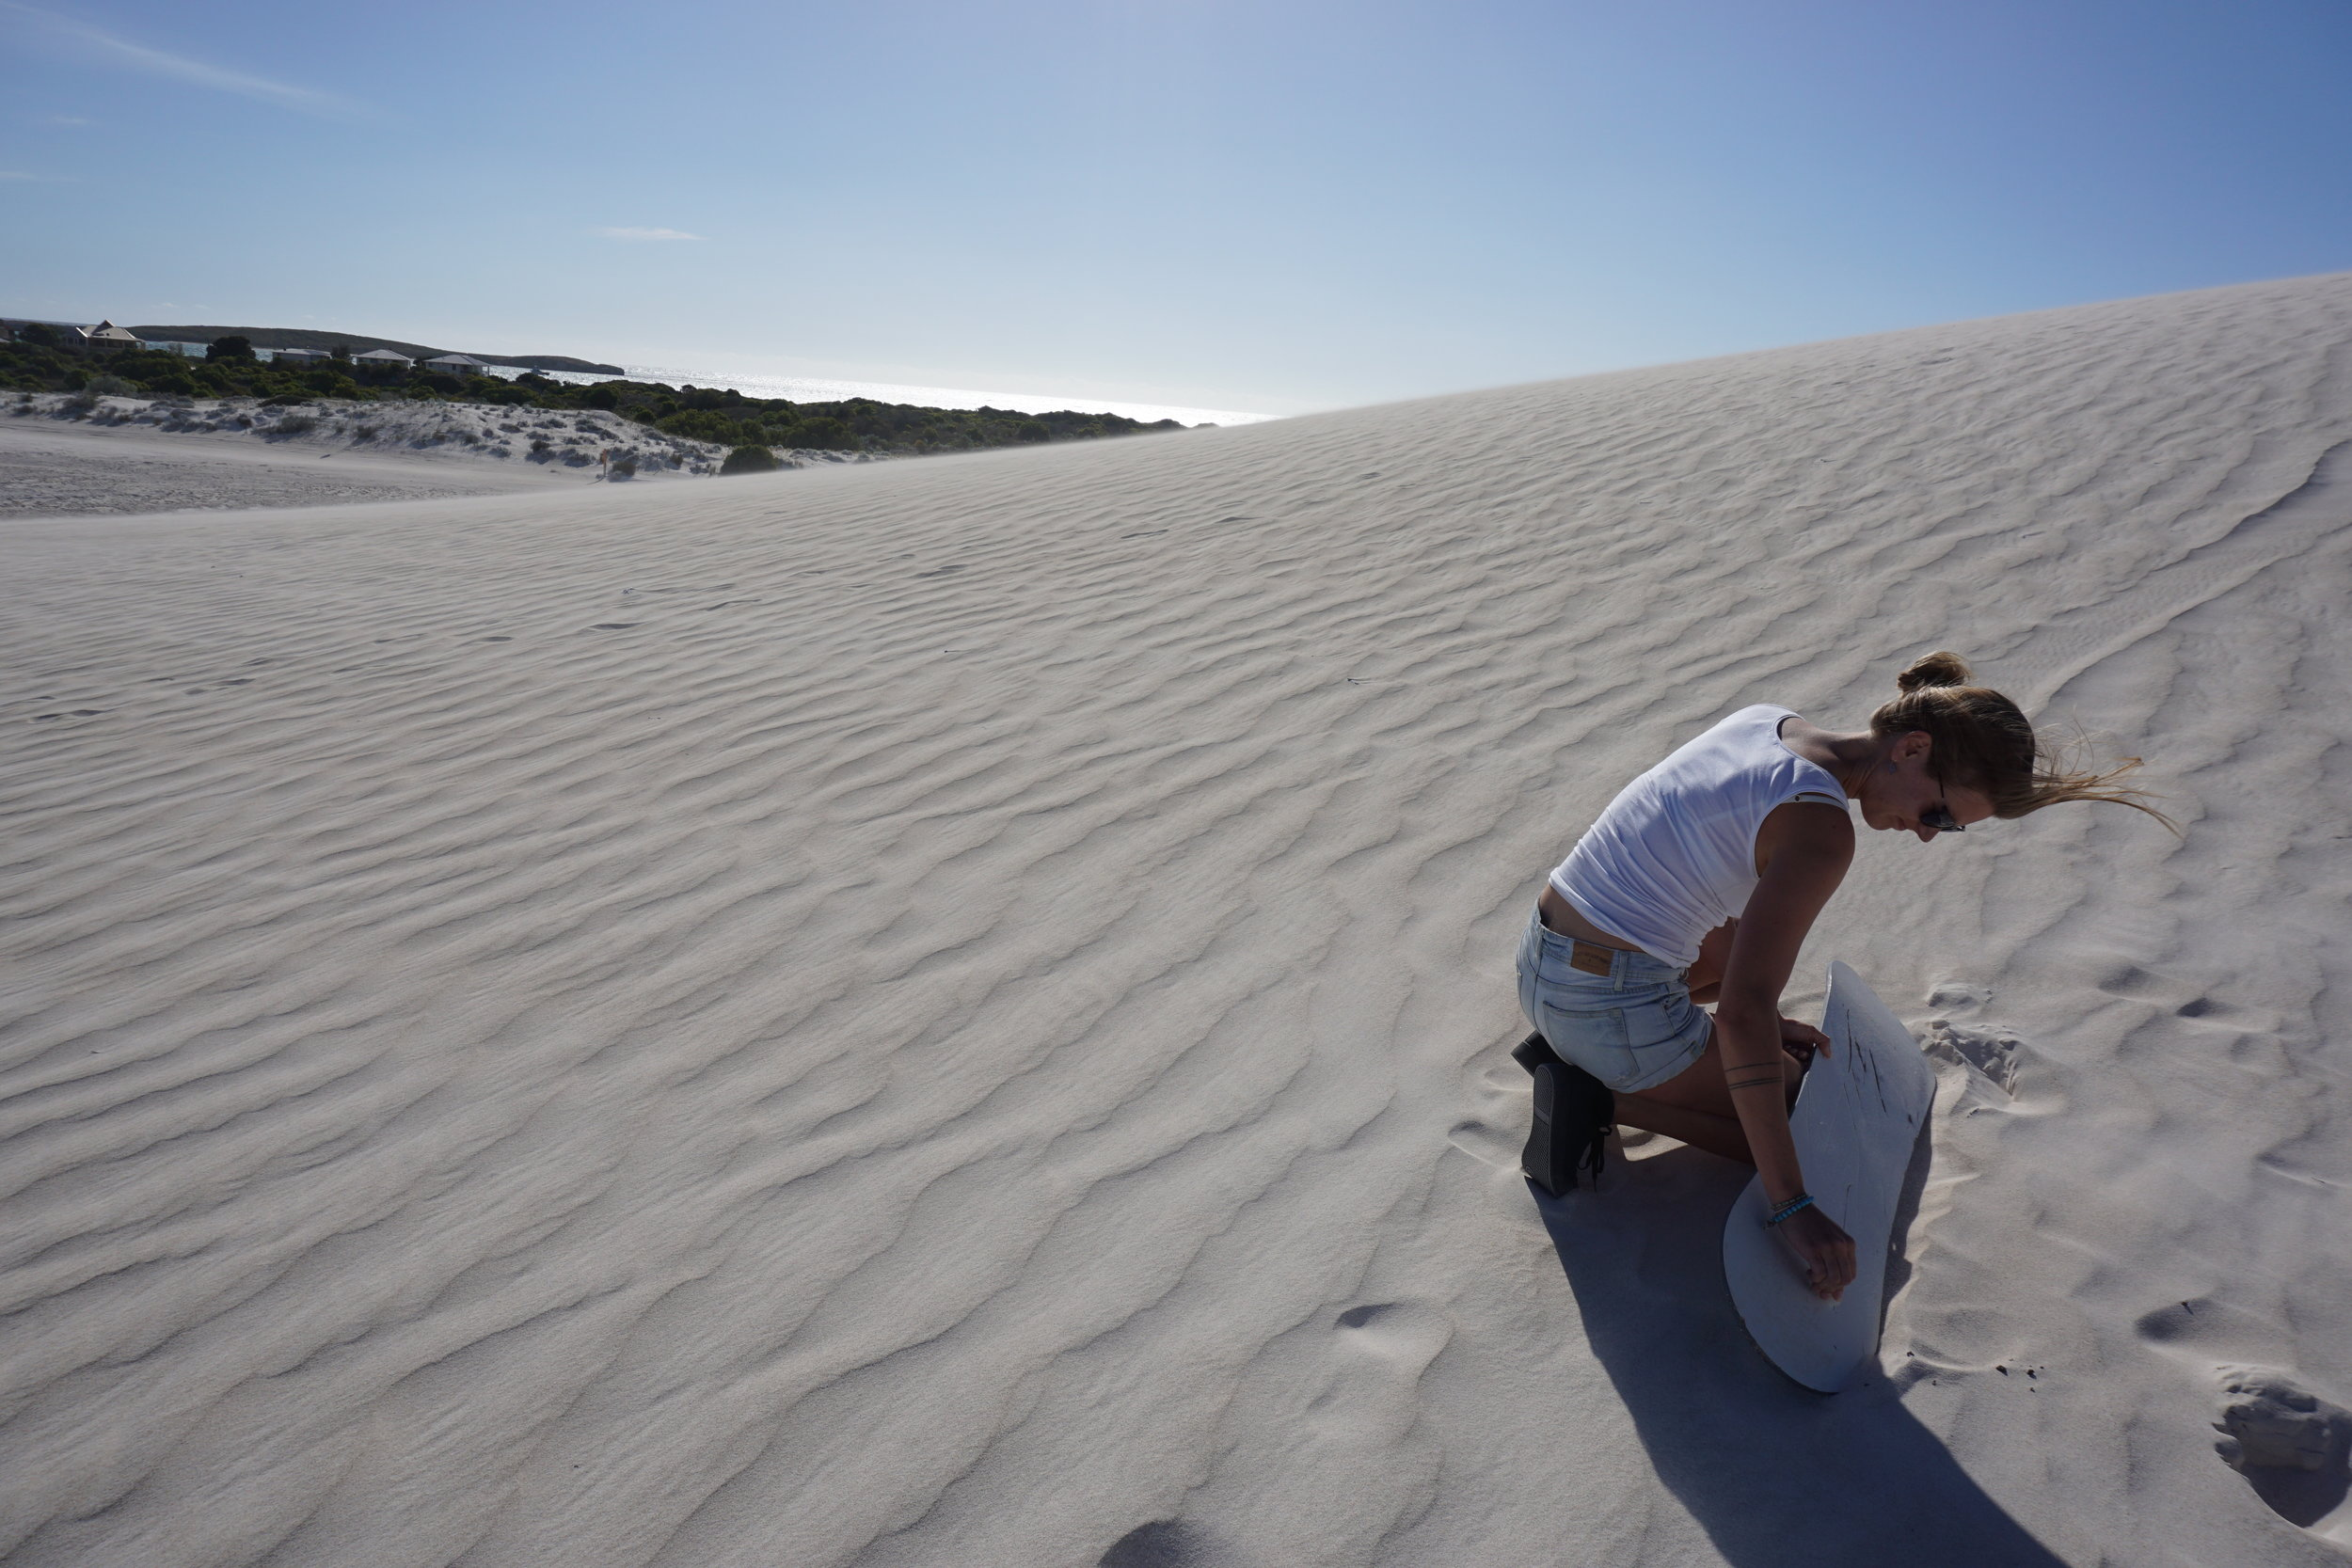 Sandboarding Lancelin, Western Australia